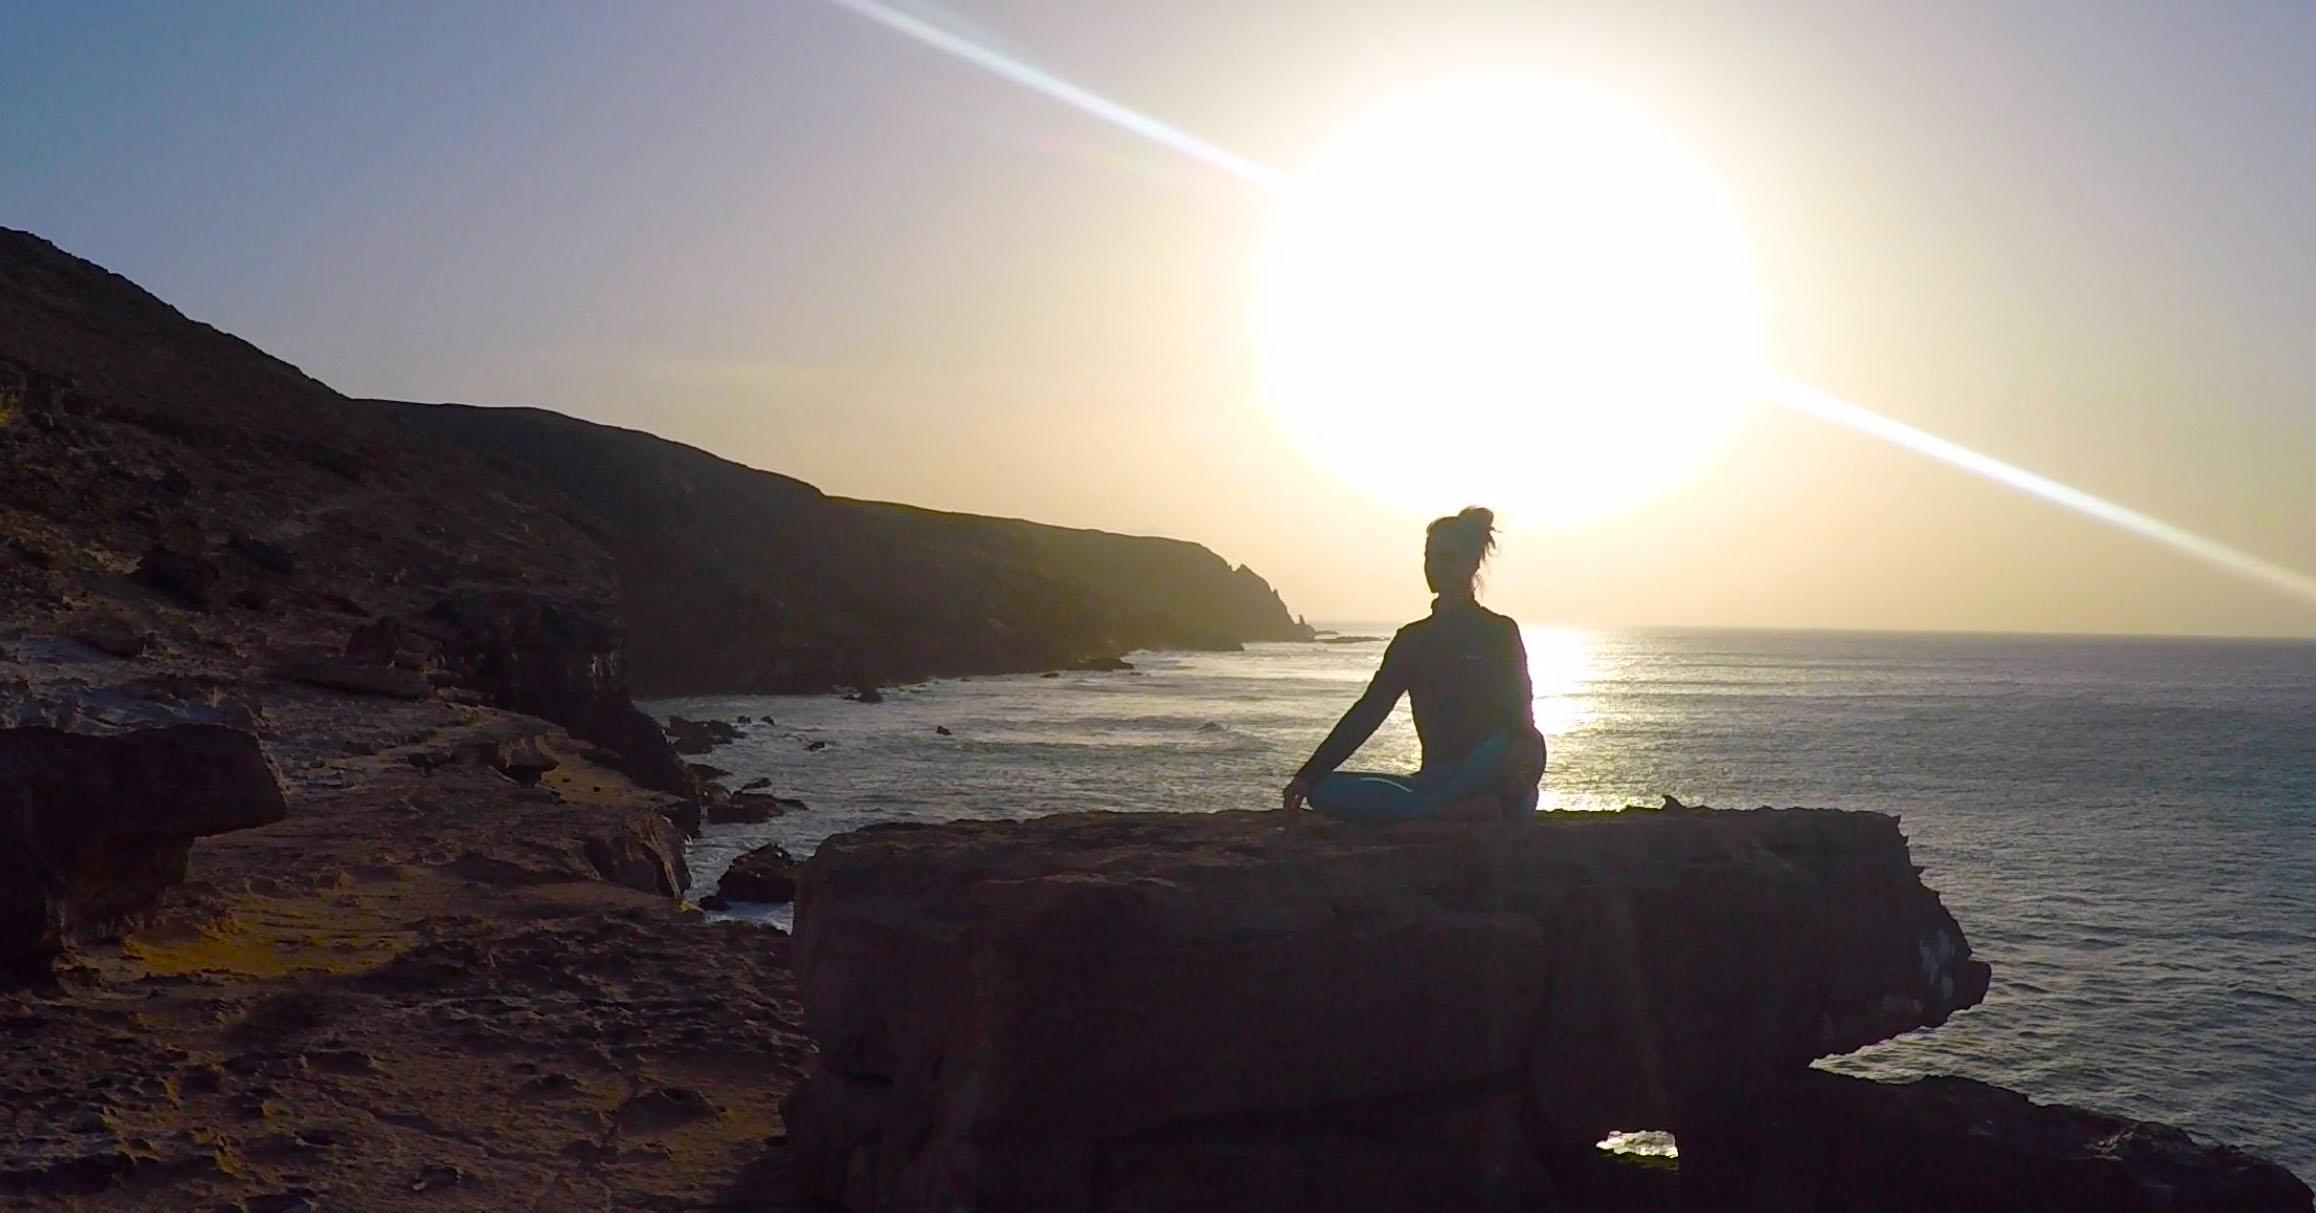 YOGA BADEN BEI WIEN - MEDITATION AM MEER CHIARADINA